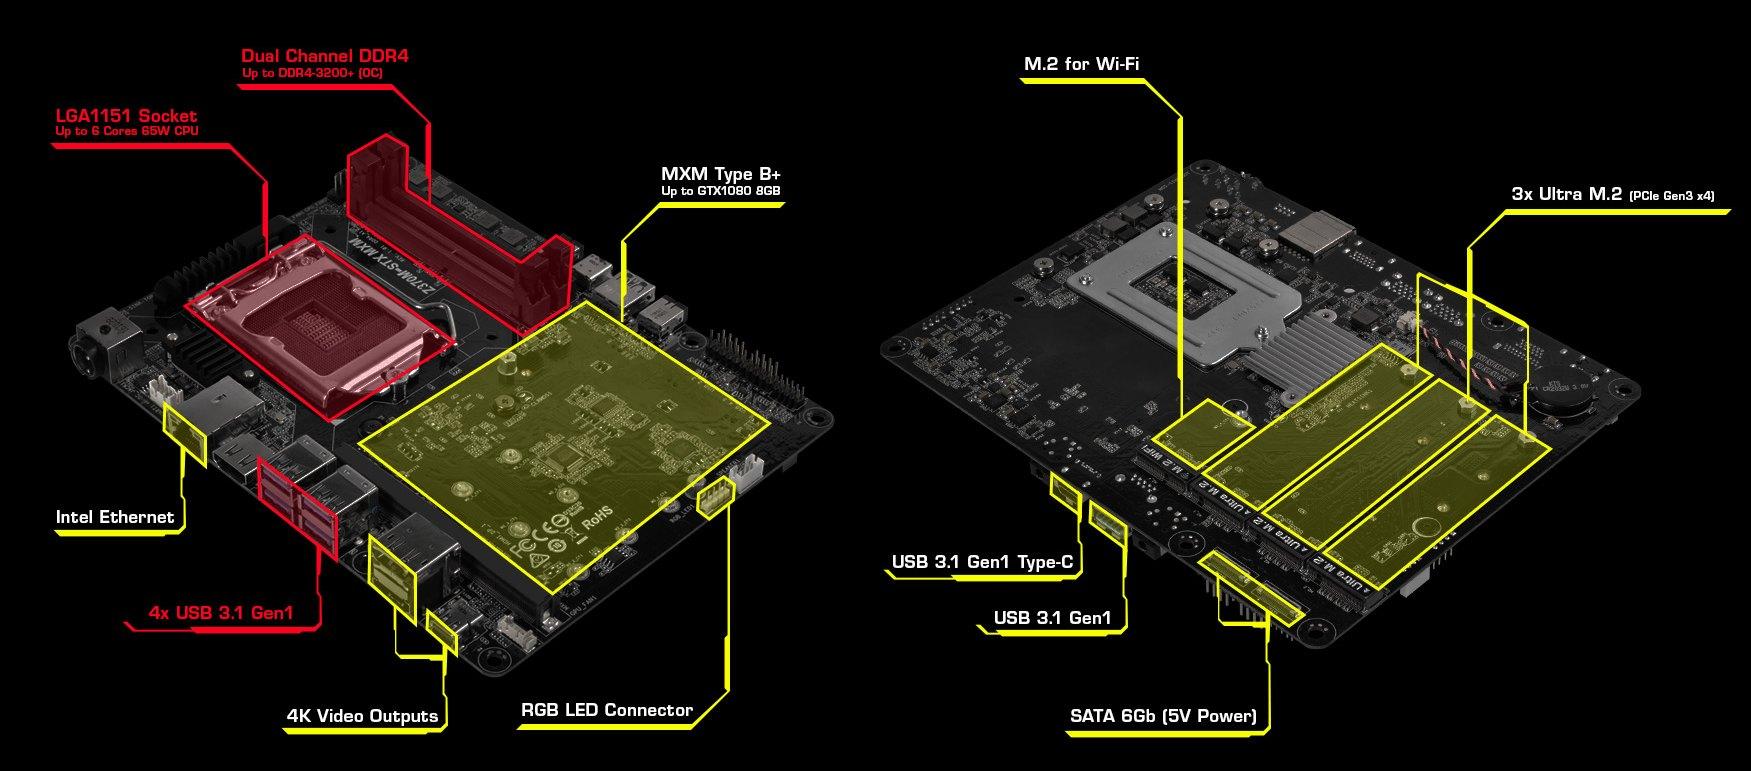 New barebones from ASRock: Mini-STX with GPU - HWCooling net